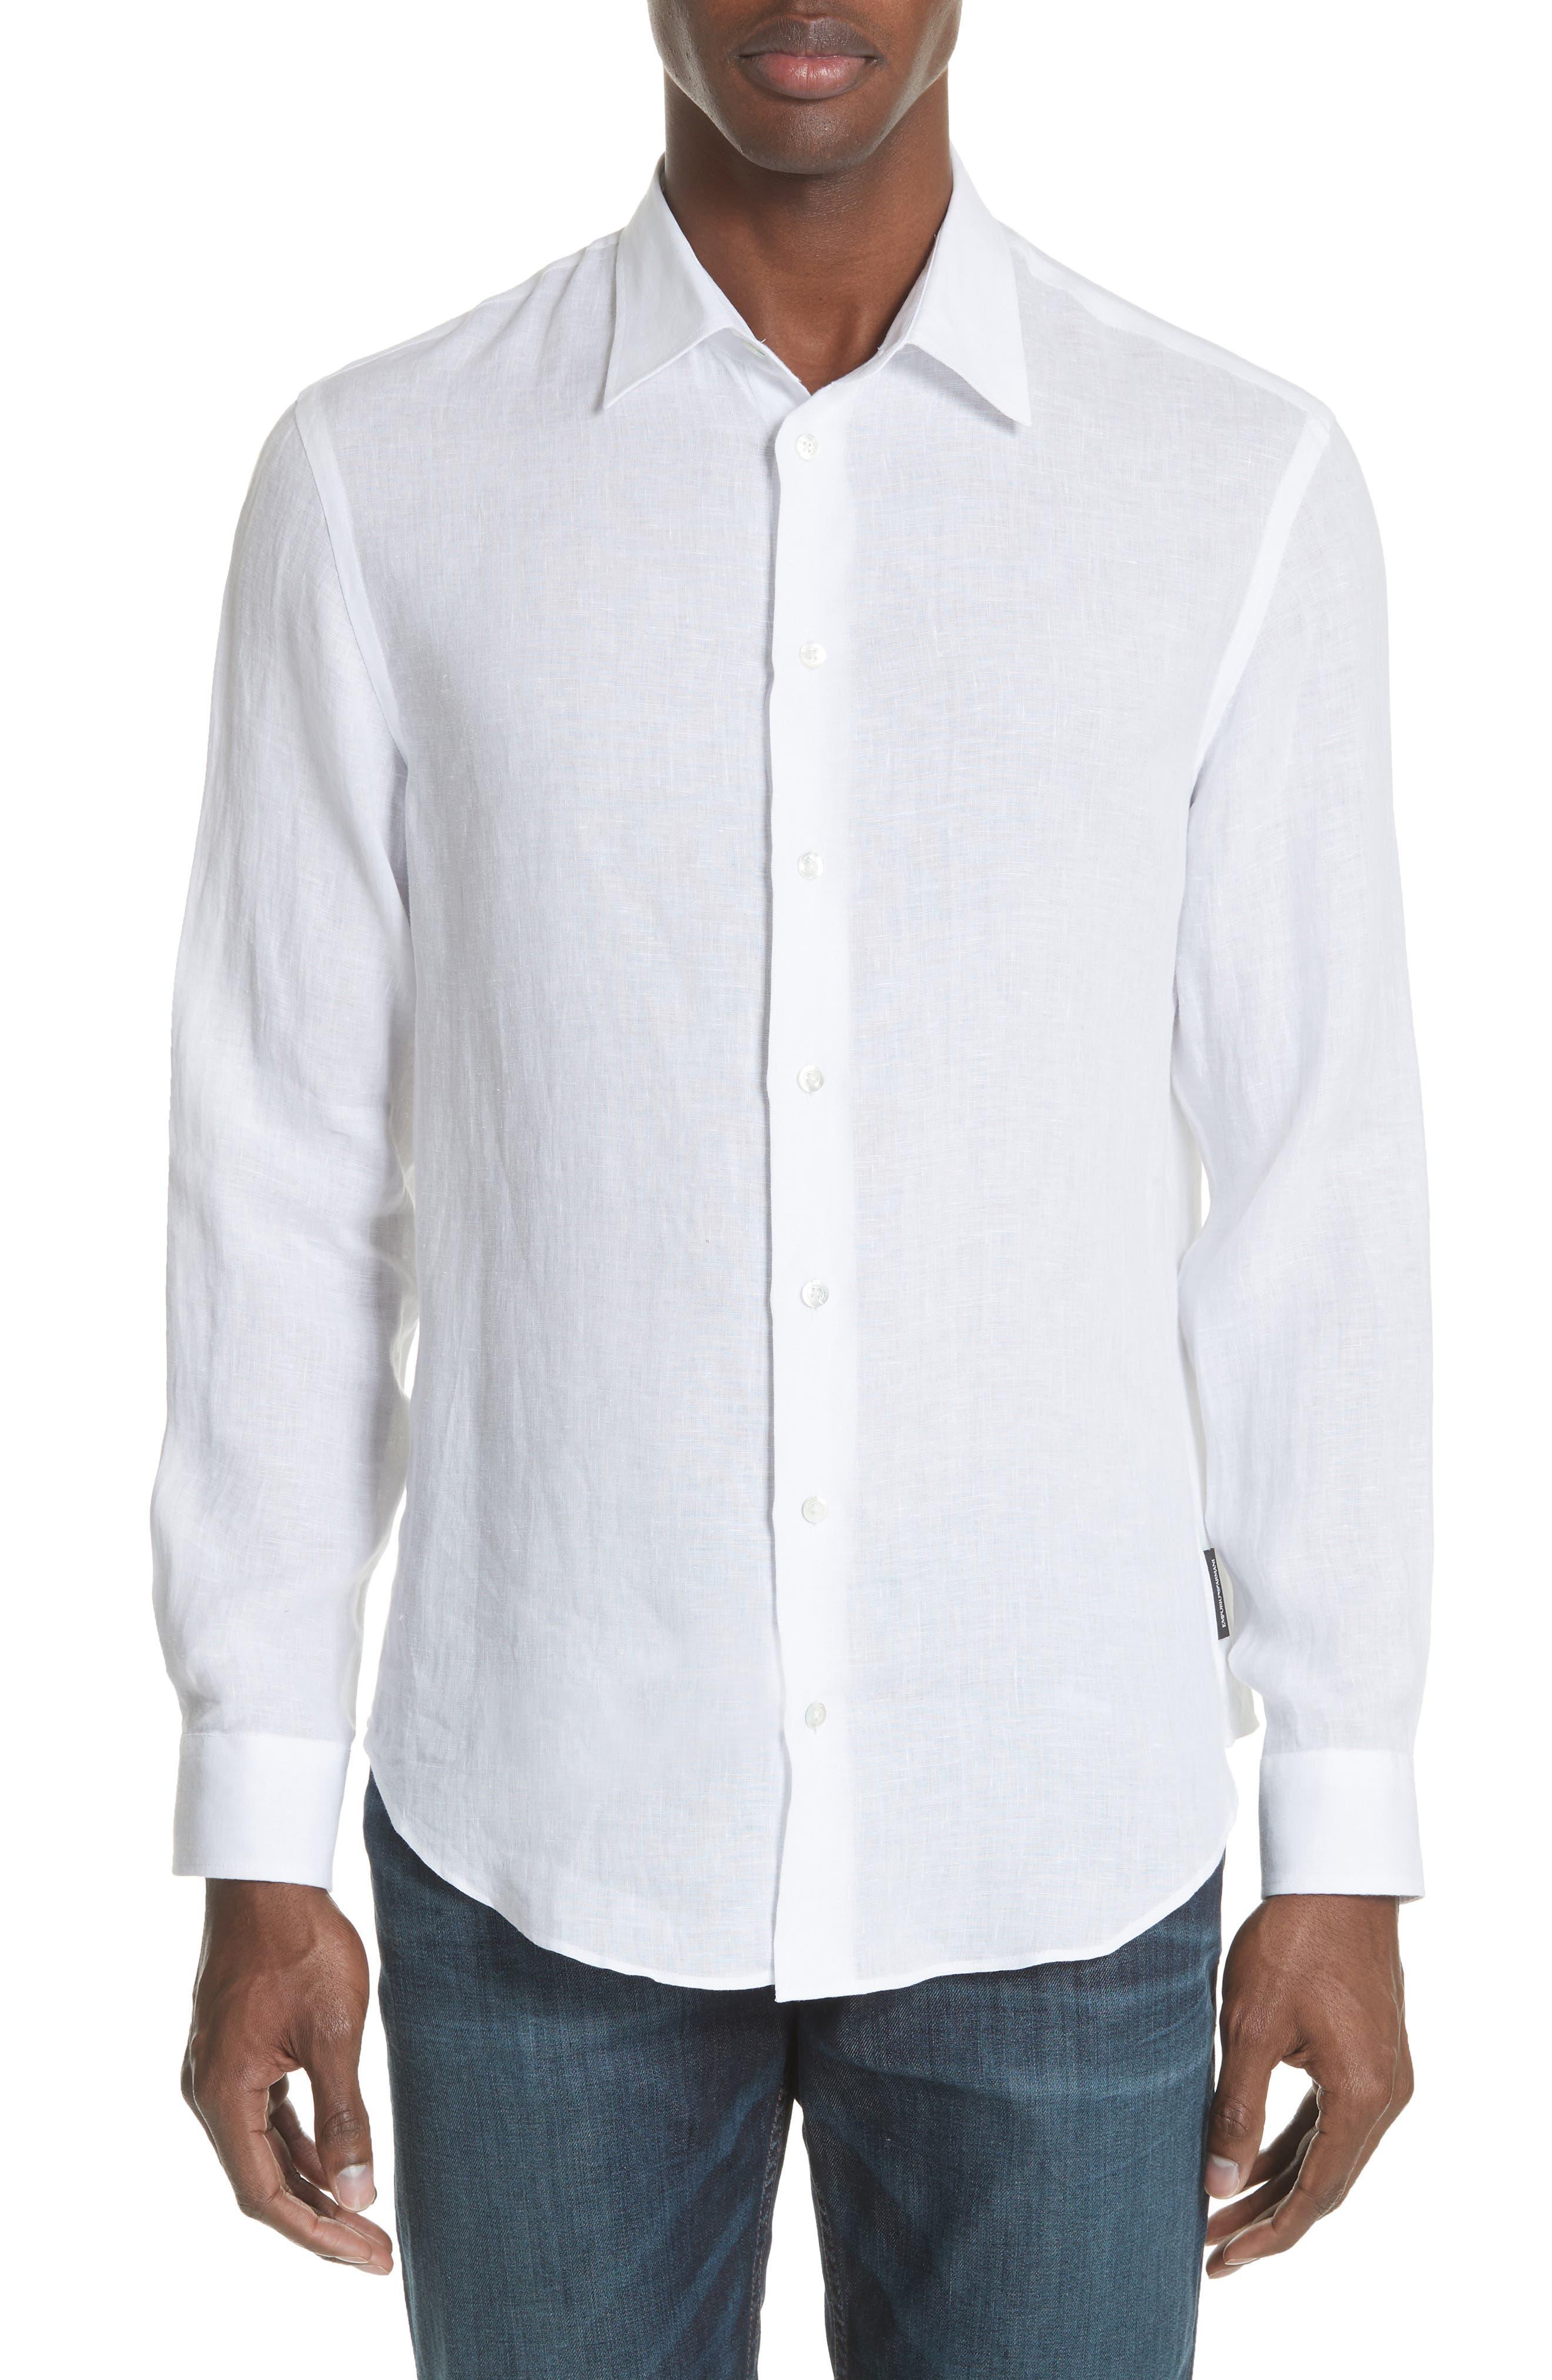 Emporio Armani Regular Fit Linen Dress Shirt